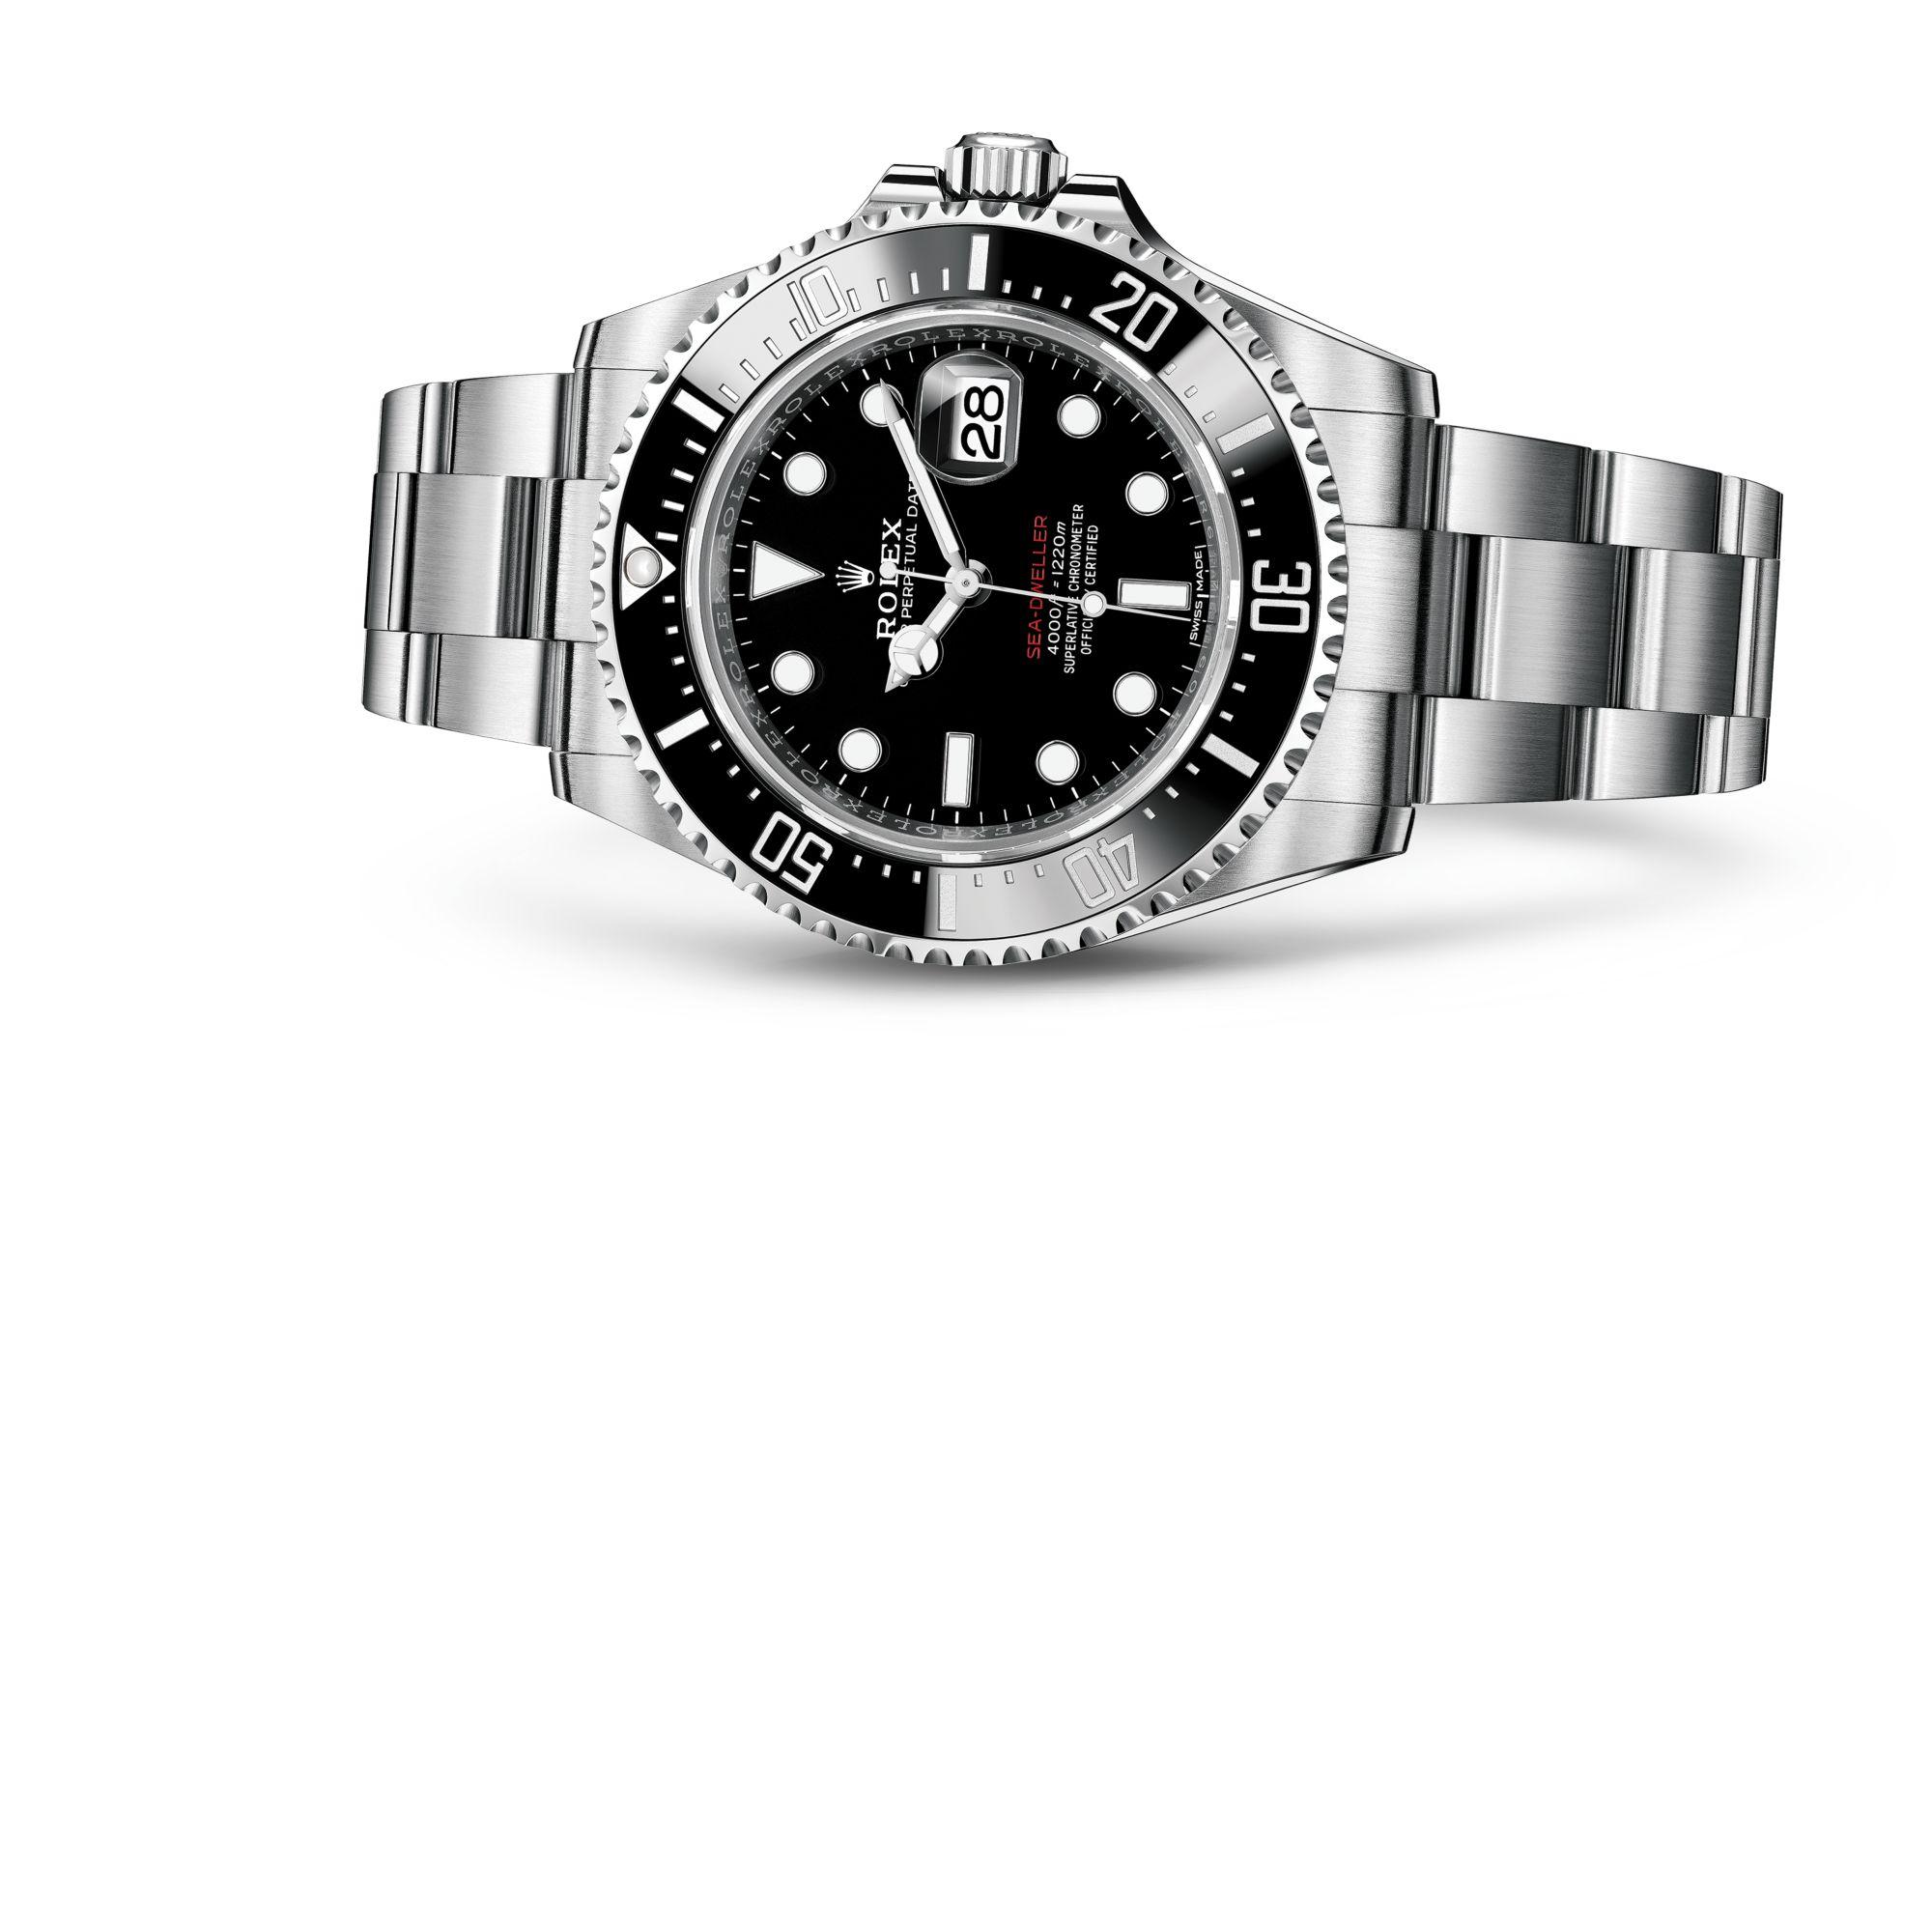 Rolex Sea-Dweller M126600-0001